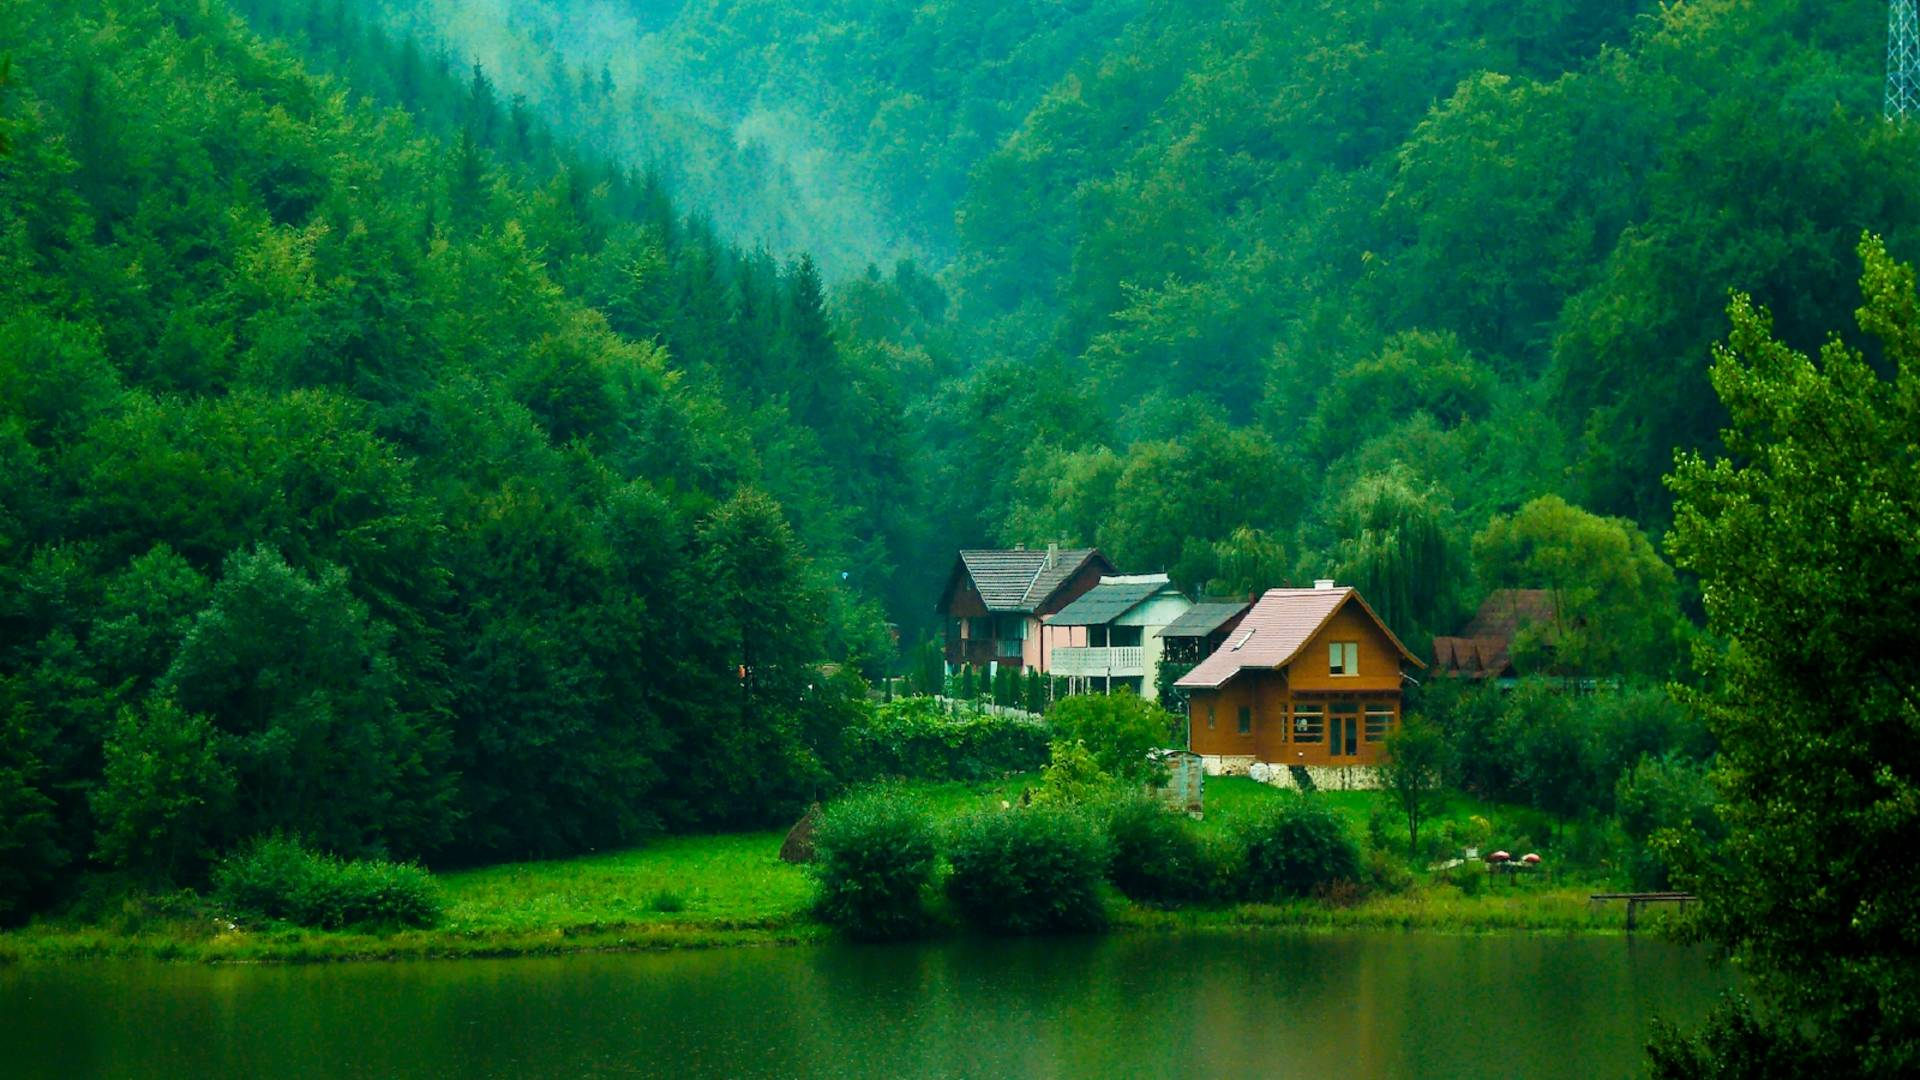 green landscapes peaceful desktop 1920x1080 hd wallpaper 1523885